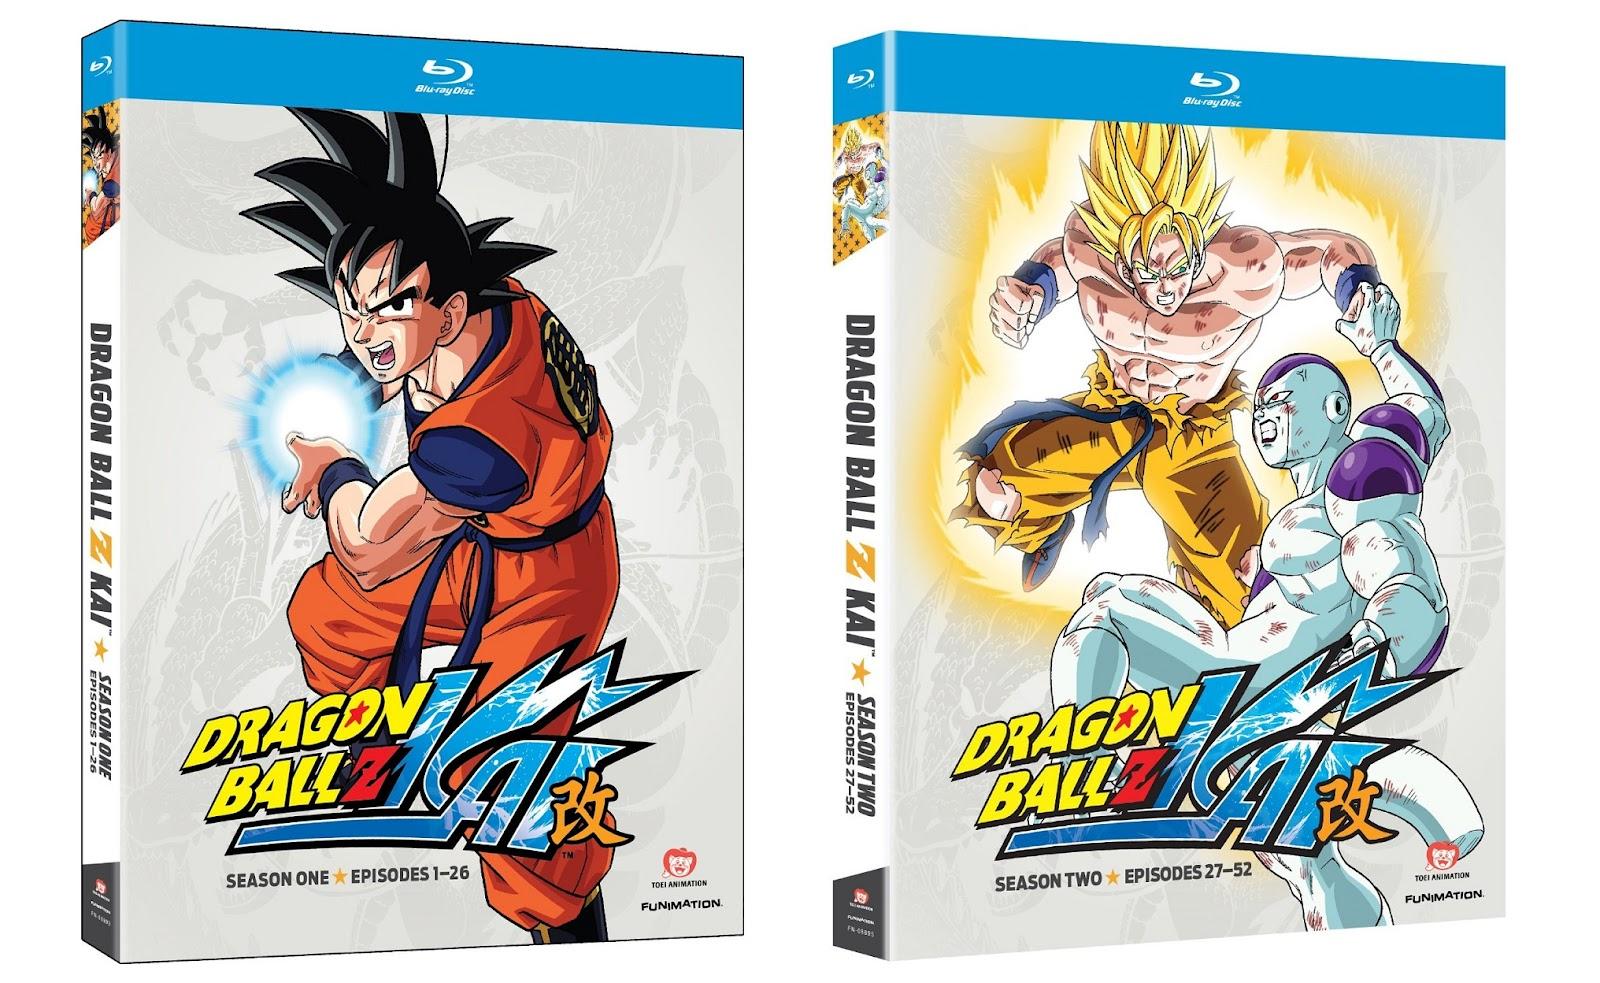 Aesthetica Of A Rogue Hero Ita anime on blu-ray!: dragon ball z kai - season one & season